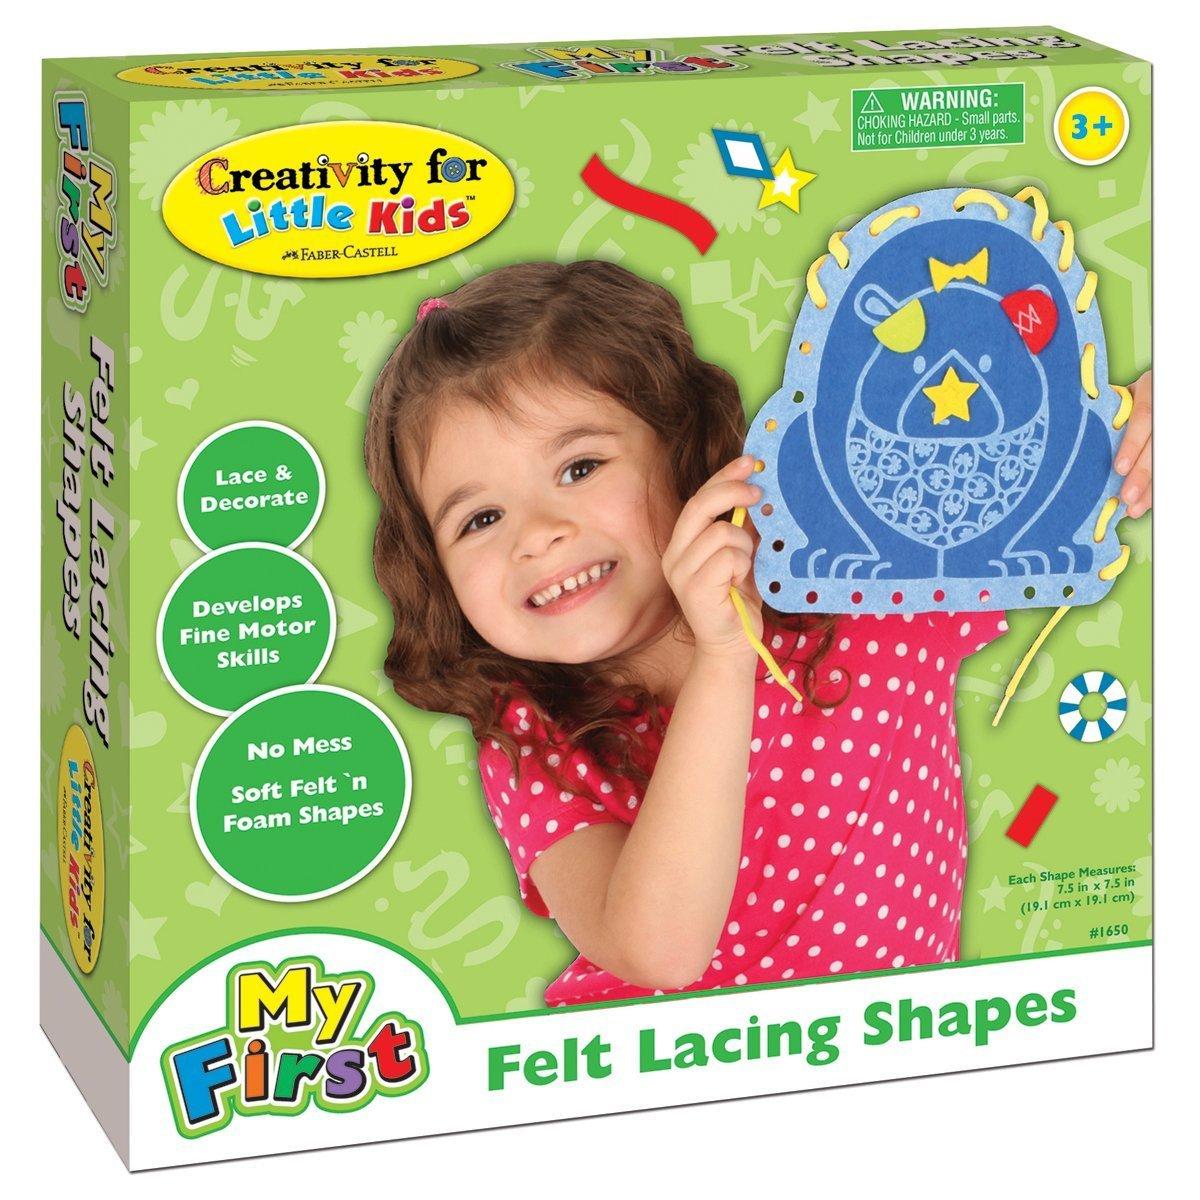 Creativity For Kids - My First Felt Lacing Shapes Kit B00IA5L0MO